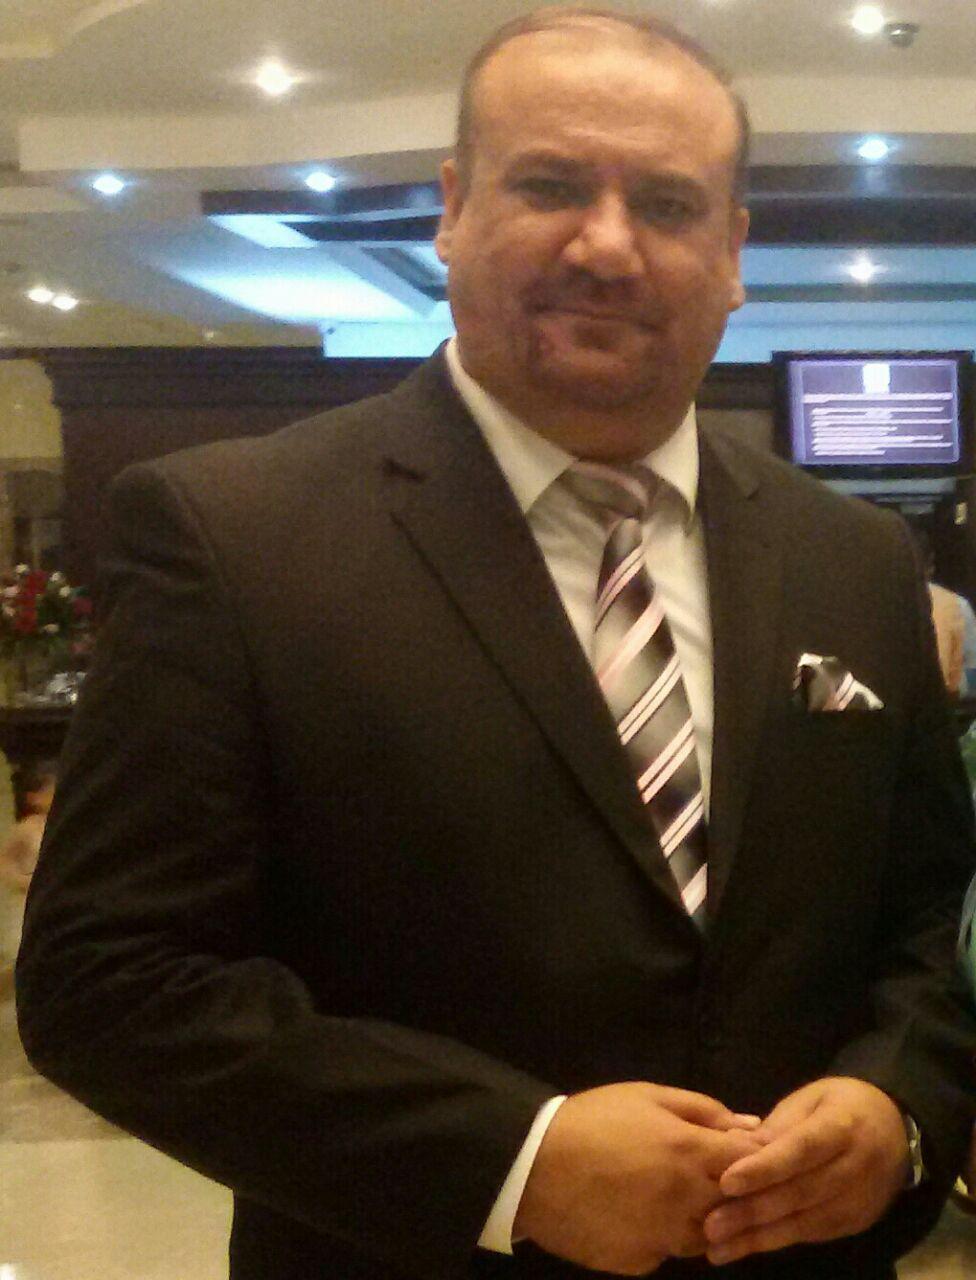 Mushtaq Hameed Abdallh